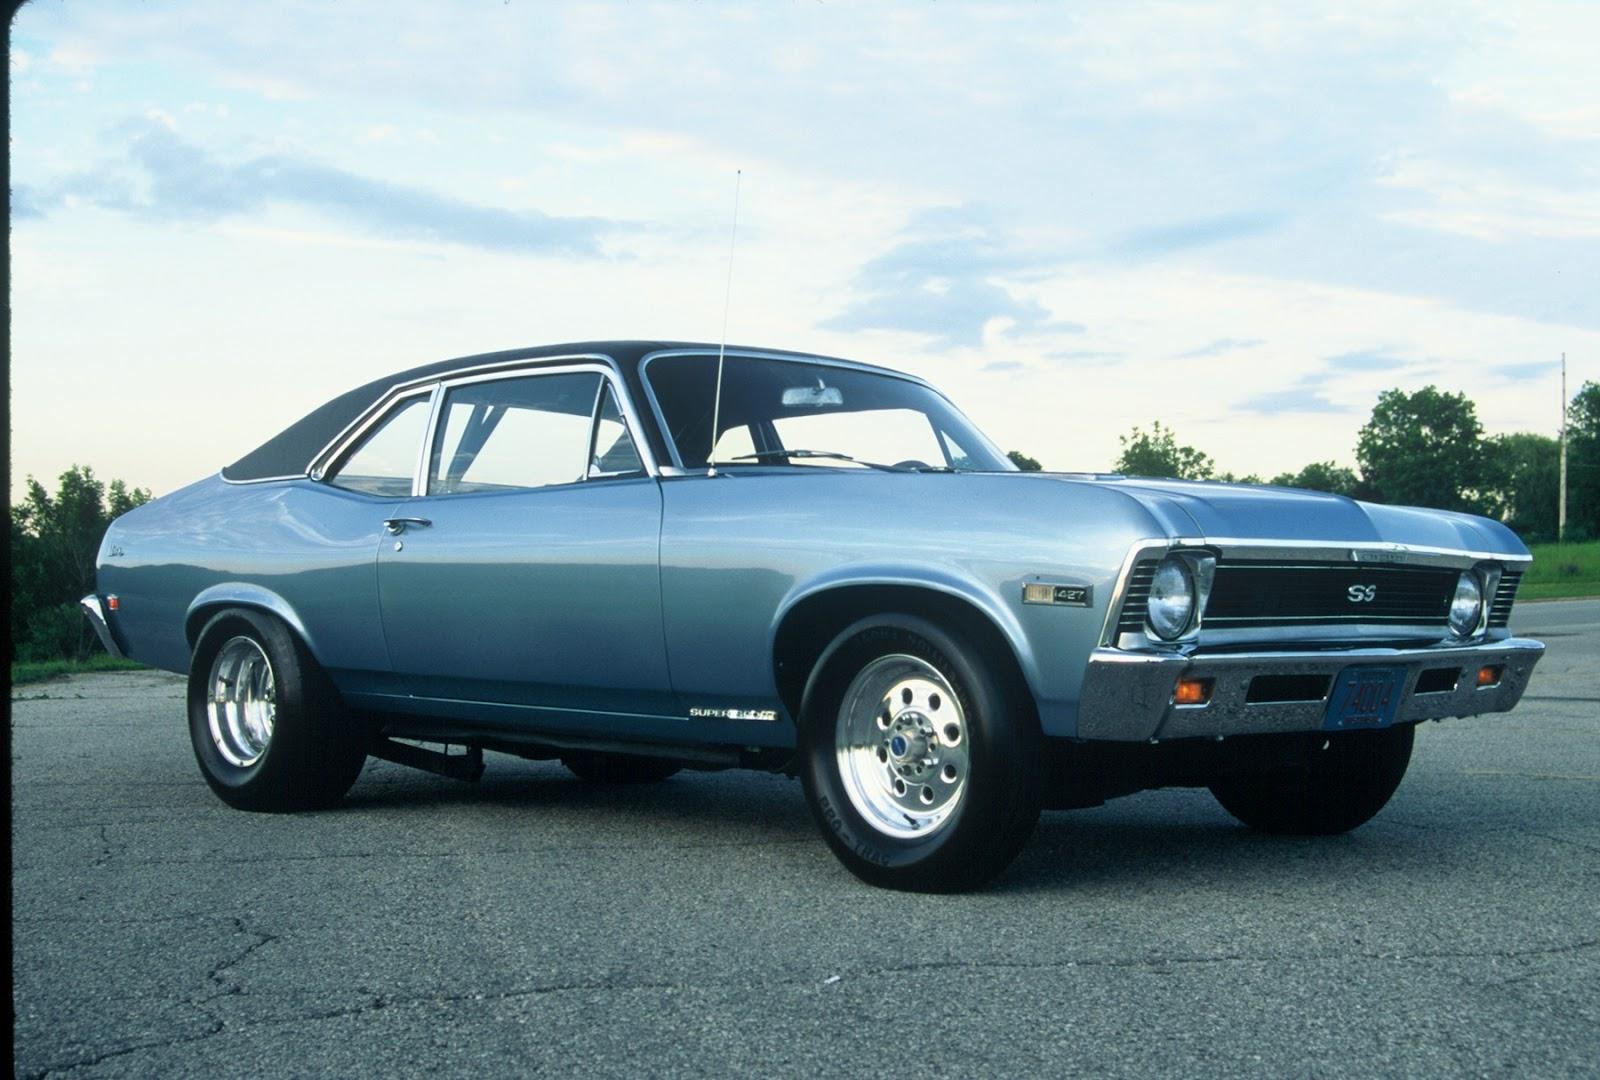 1970 Corvette For Sale By Owner >> 68 70 Nova For Sale | Autos Post